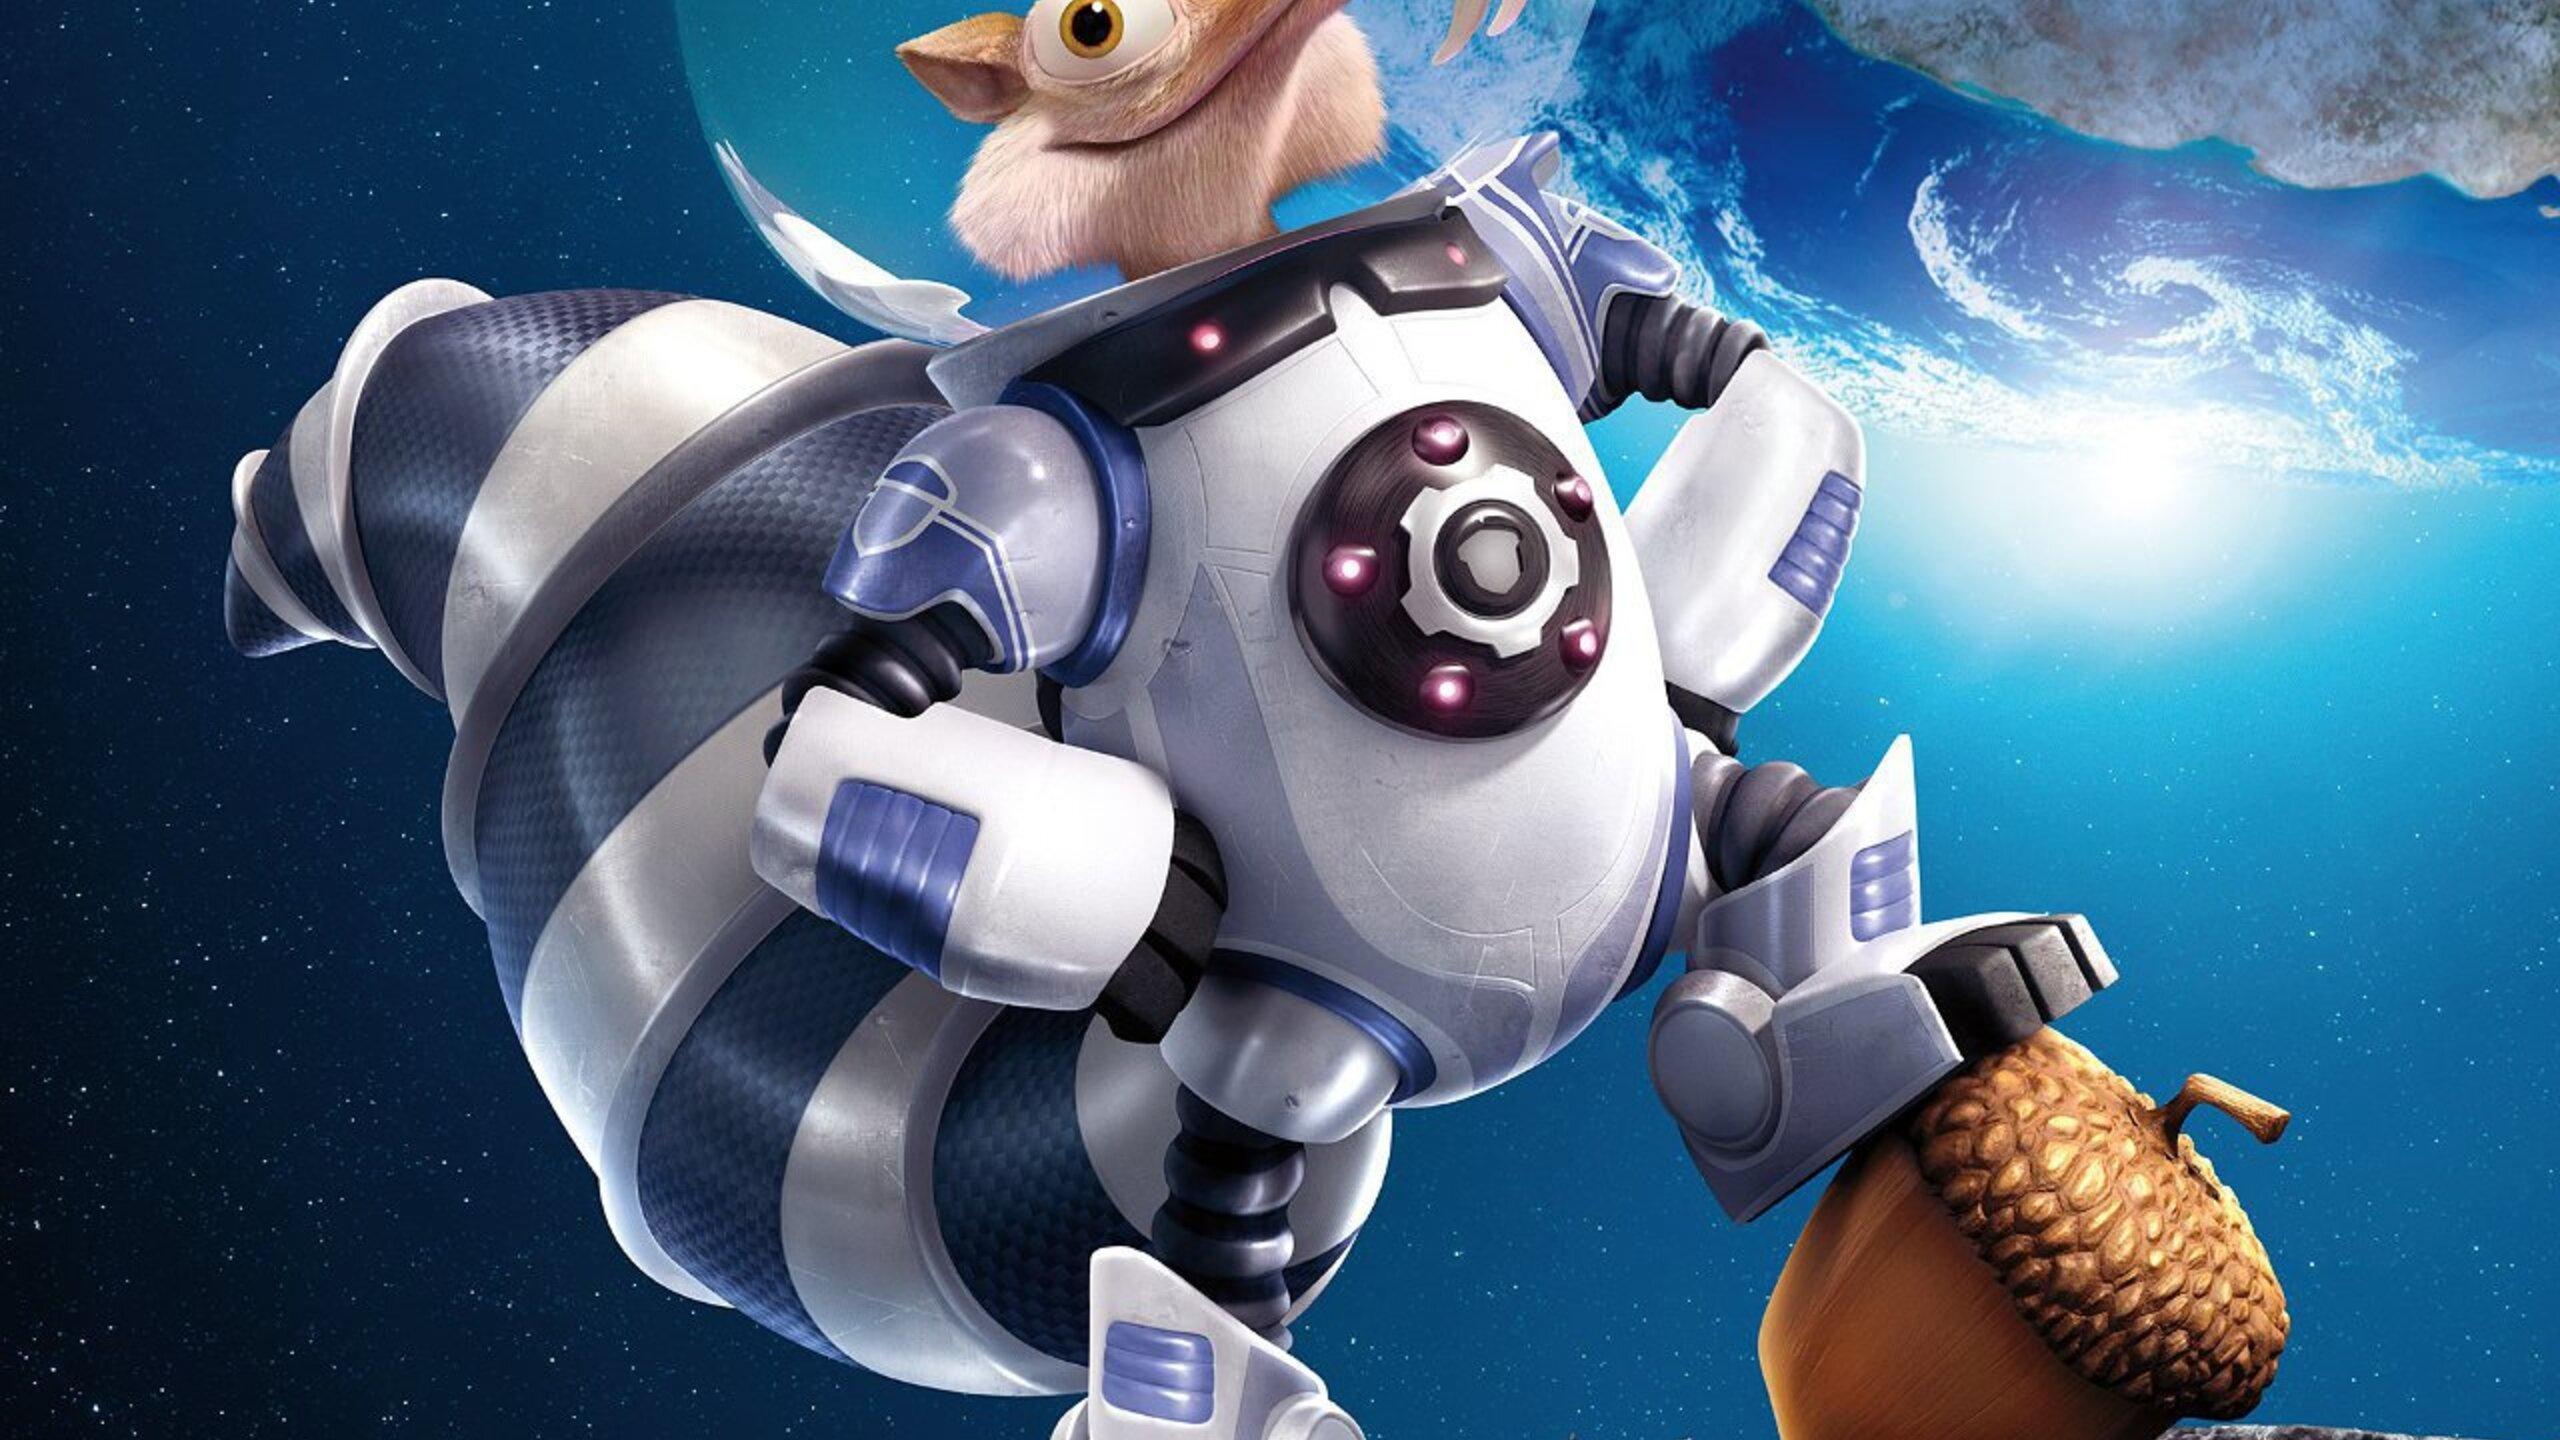 2560x1440 Ice Age 5 Animated Movie 2016 1440p Resolution Hd